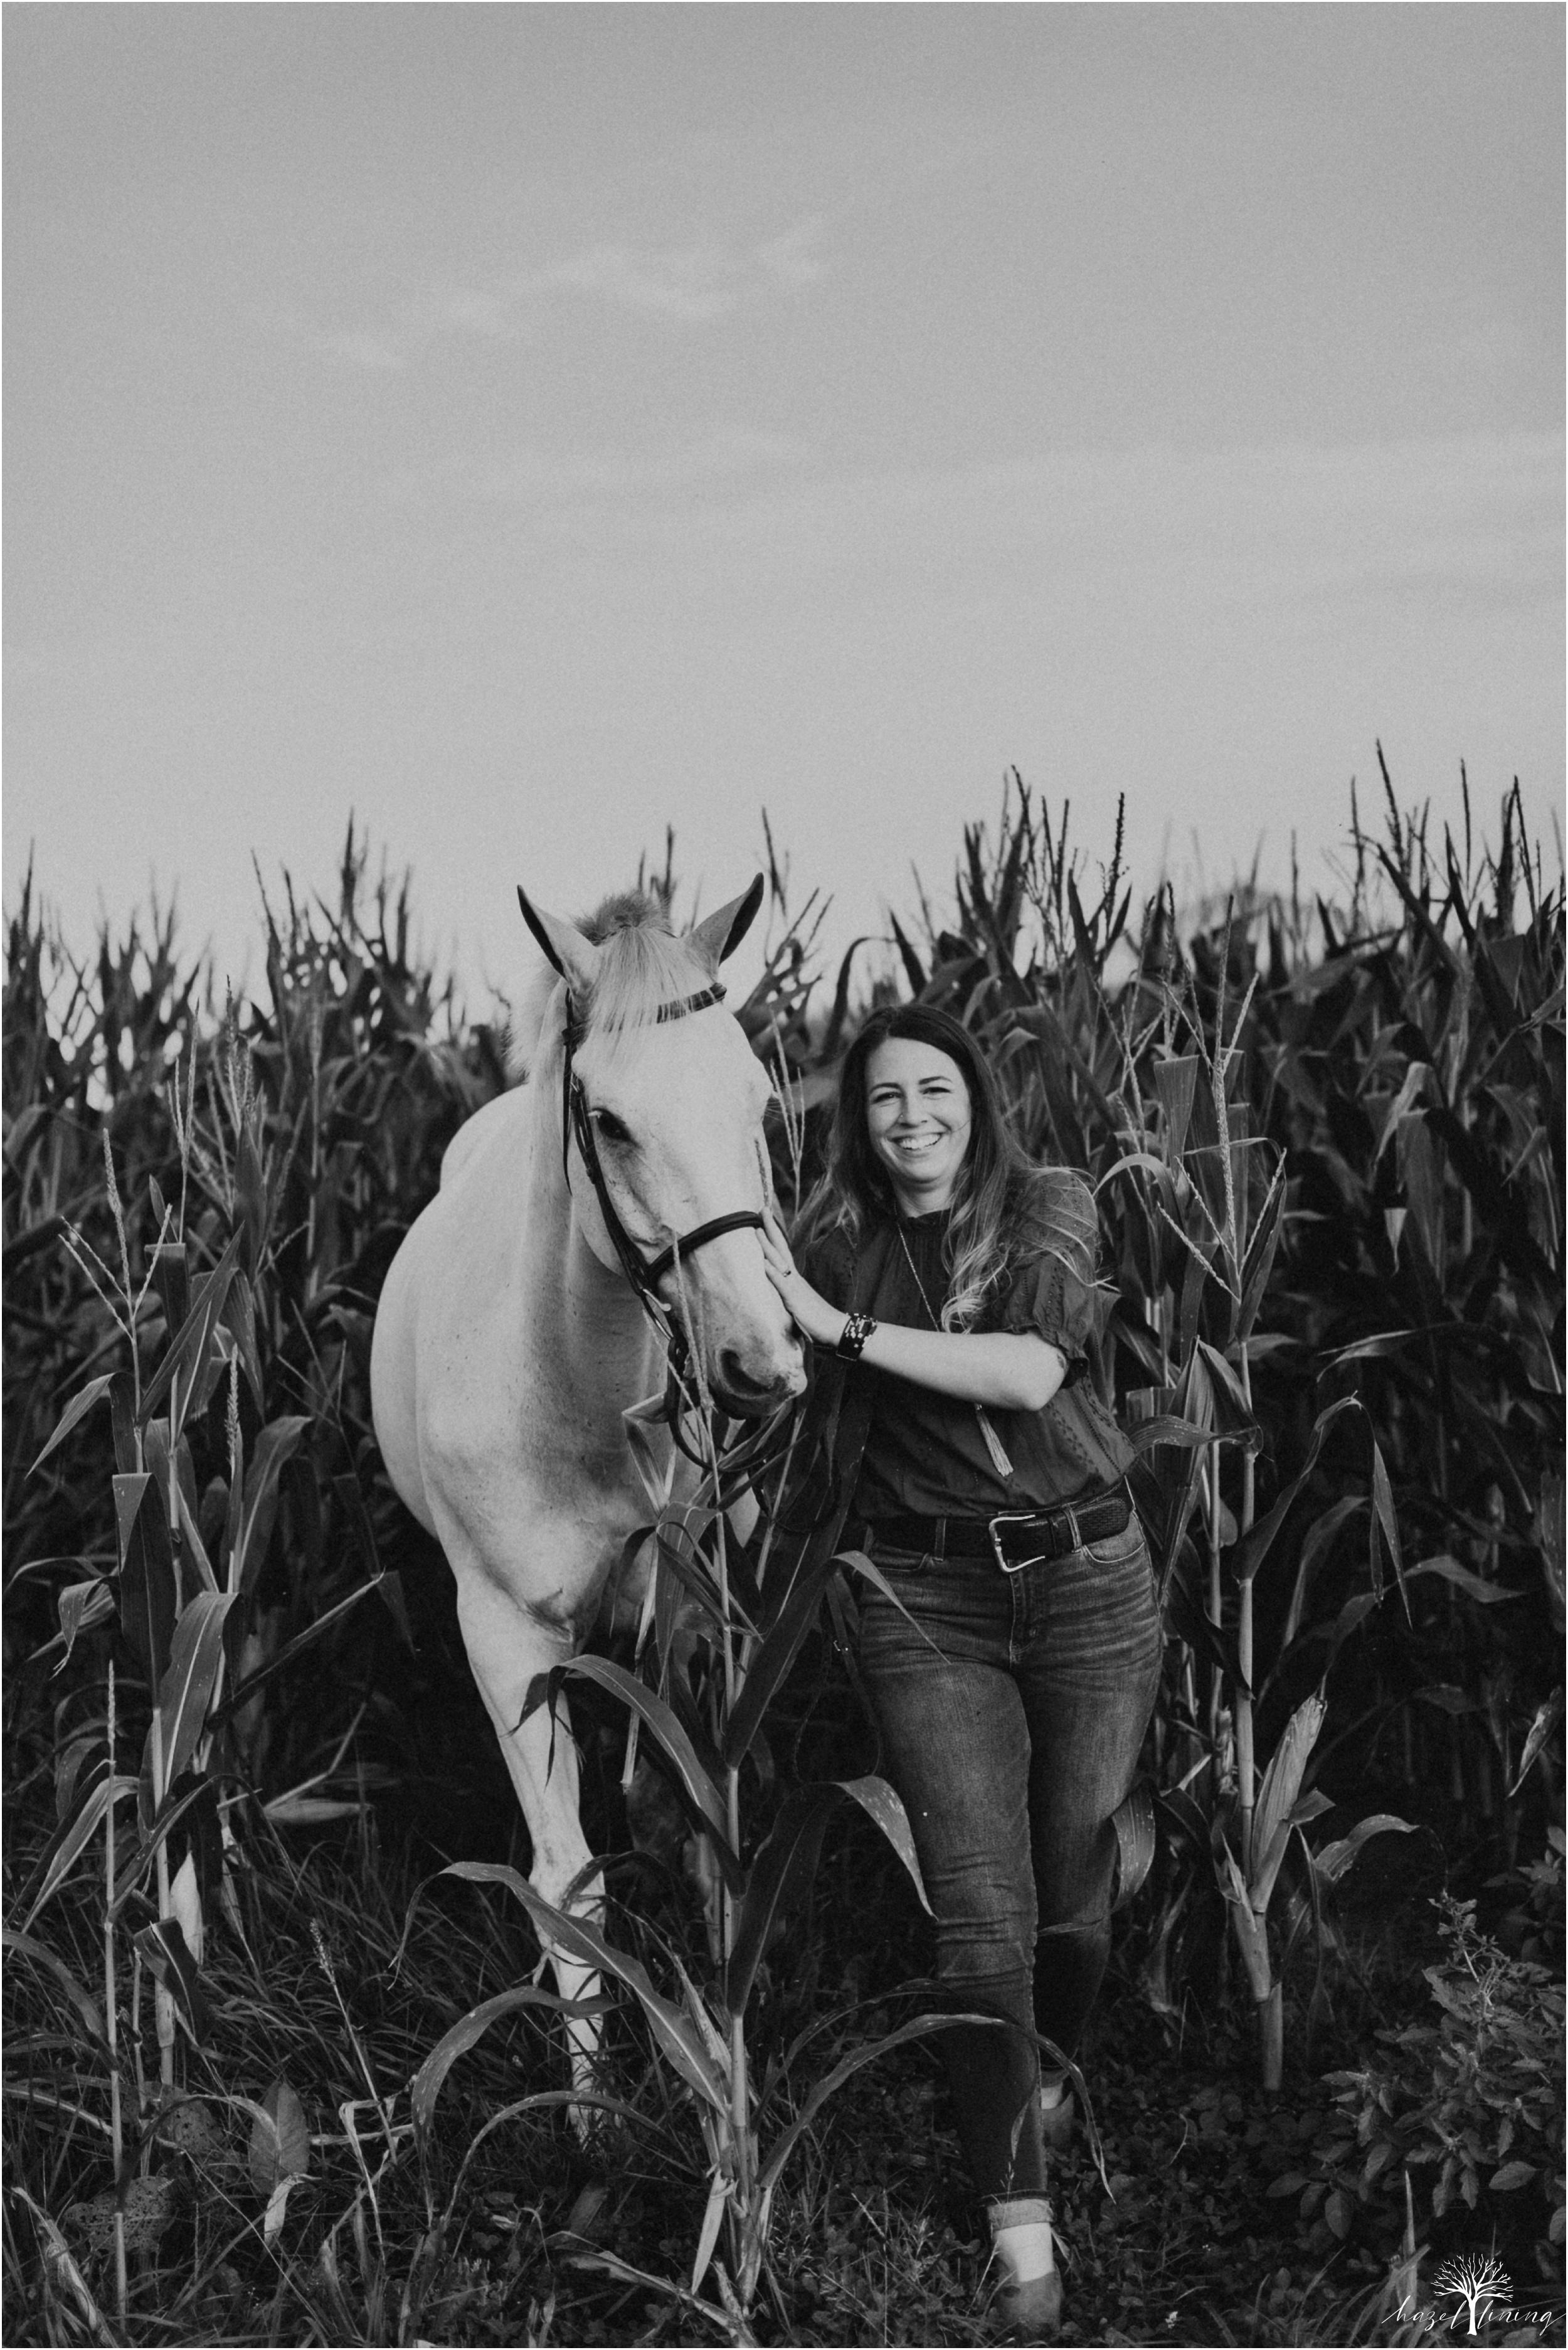 taylor-adams-and-horse-delaware-valley-university-delval-summer-equestrian-portrait-session-hazel-lining-photography-destination-elopement-wedding-engagement-photography_0030.jpg